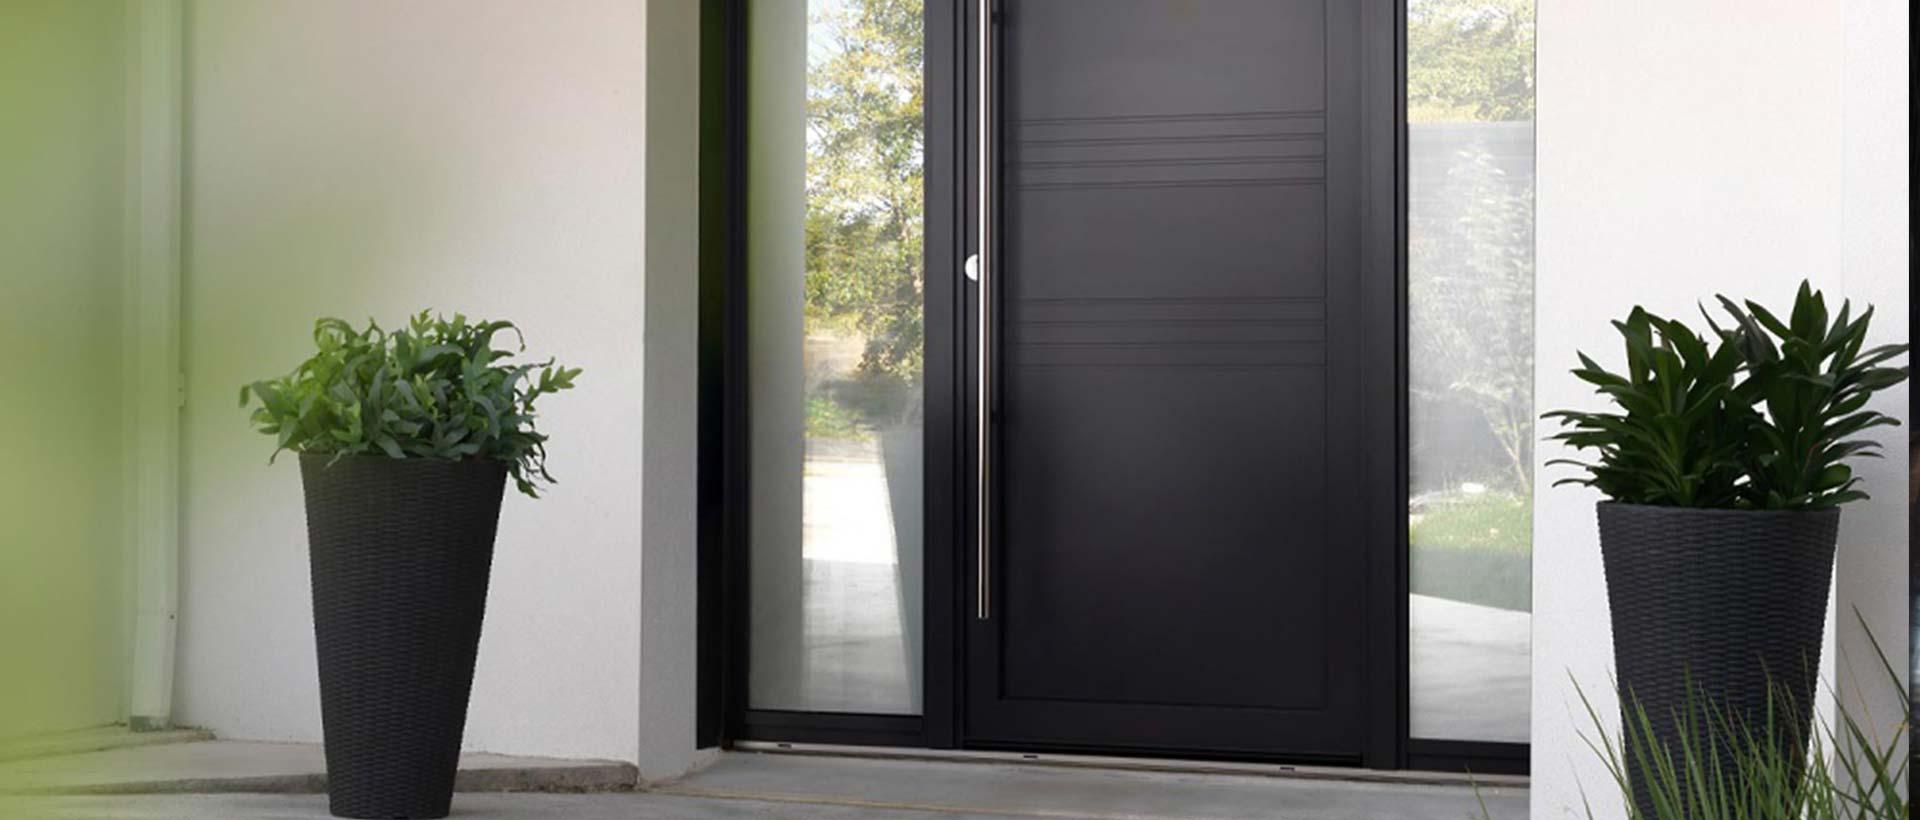 porte d entr e type riviere mc france mvm. Black Bedroom Furniture Sets. Home Design Ideas